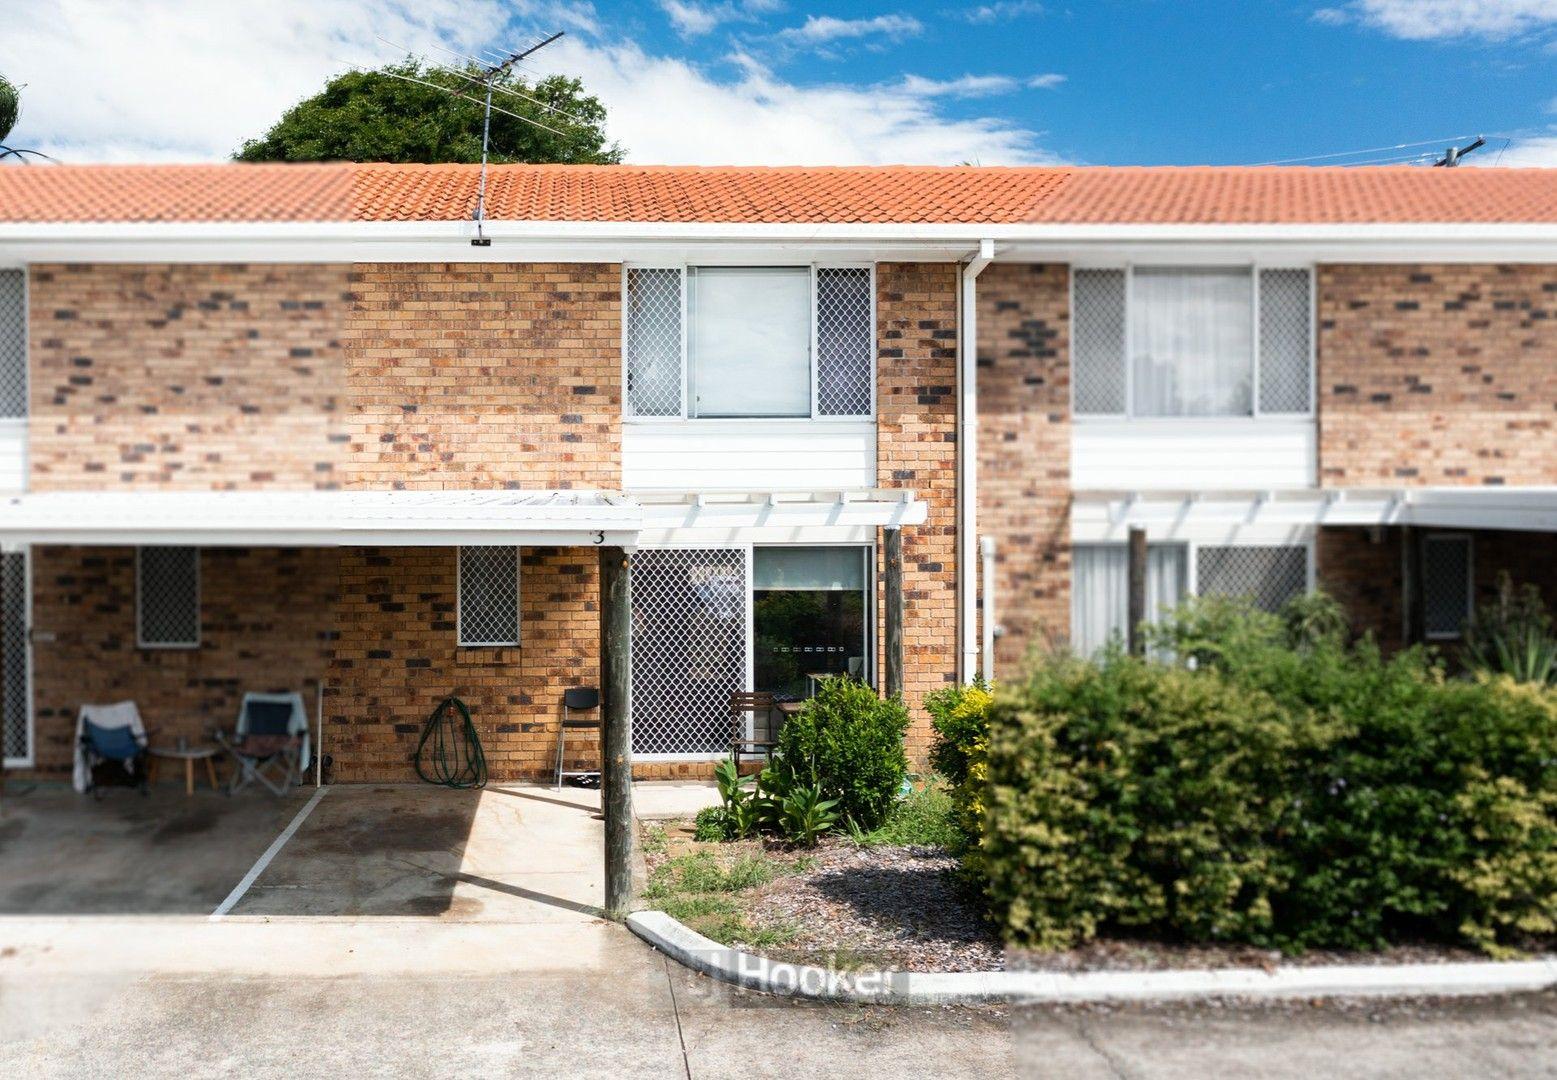 3/54 Monash Road, Loganlea QLD 4131